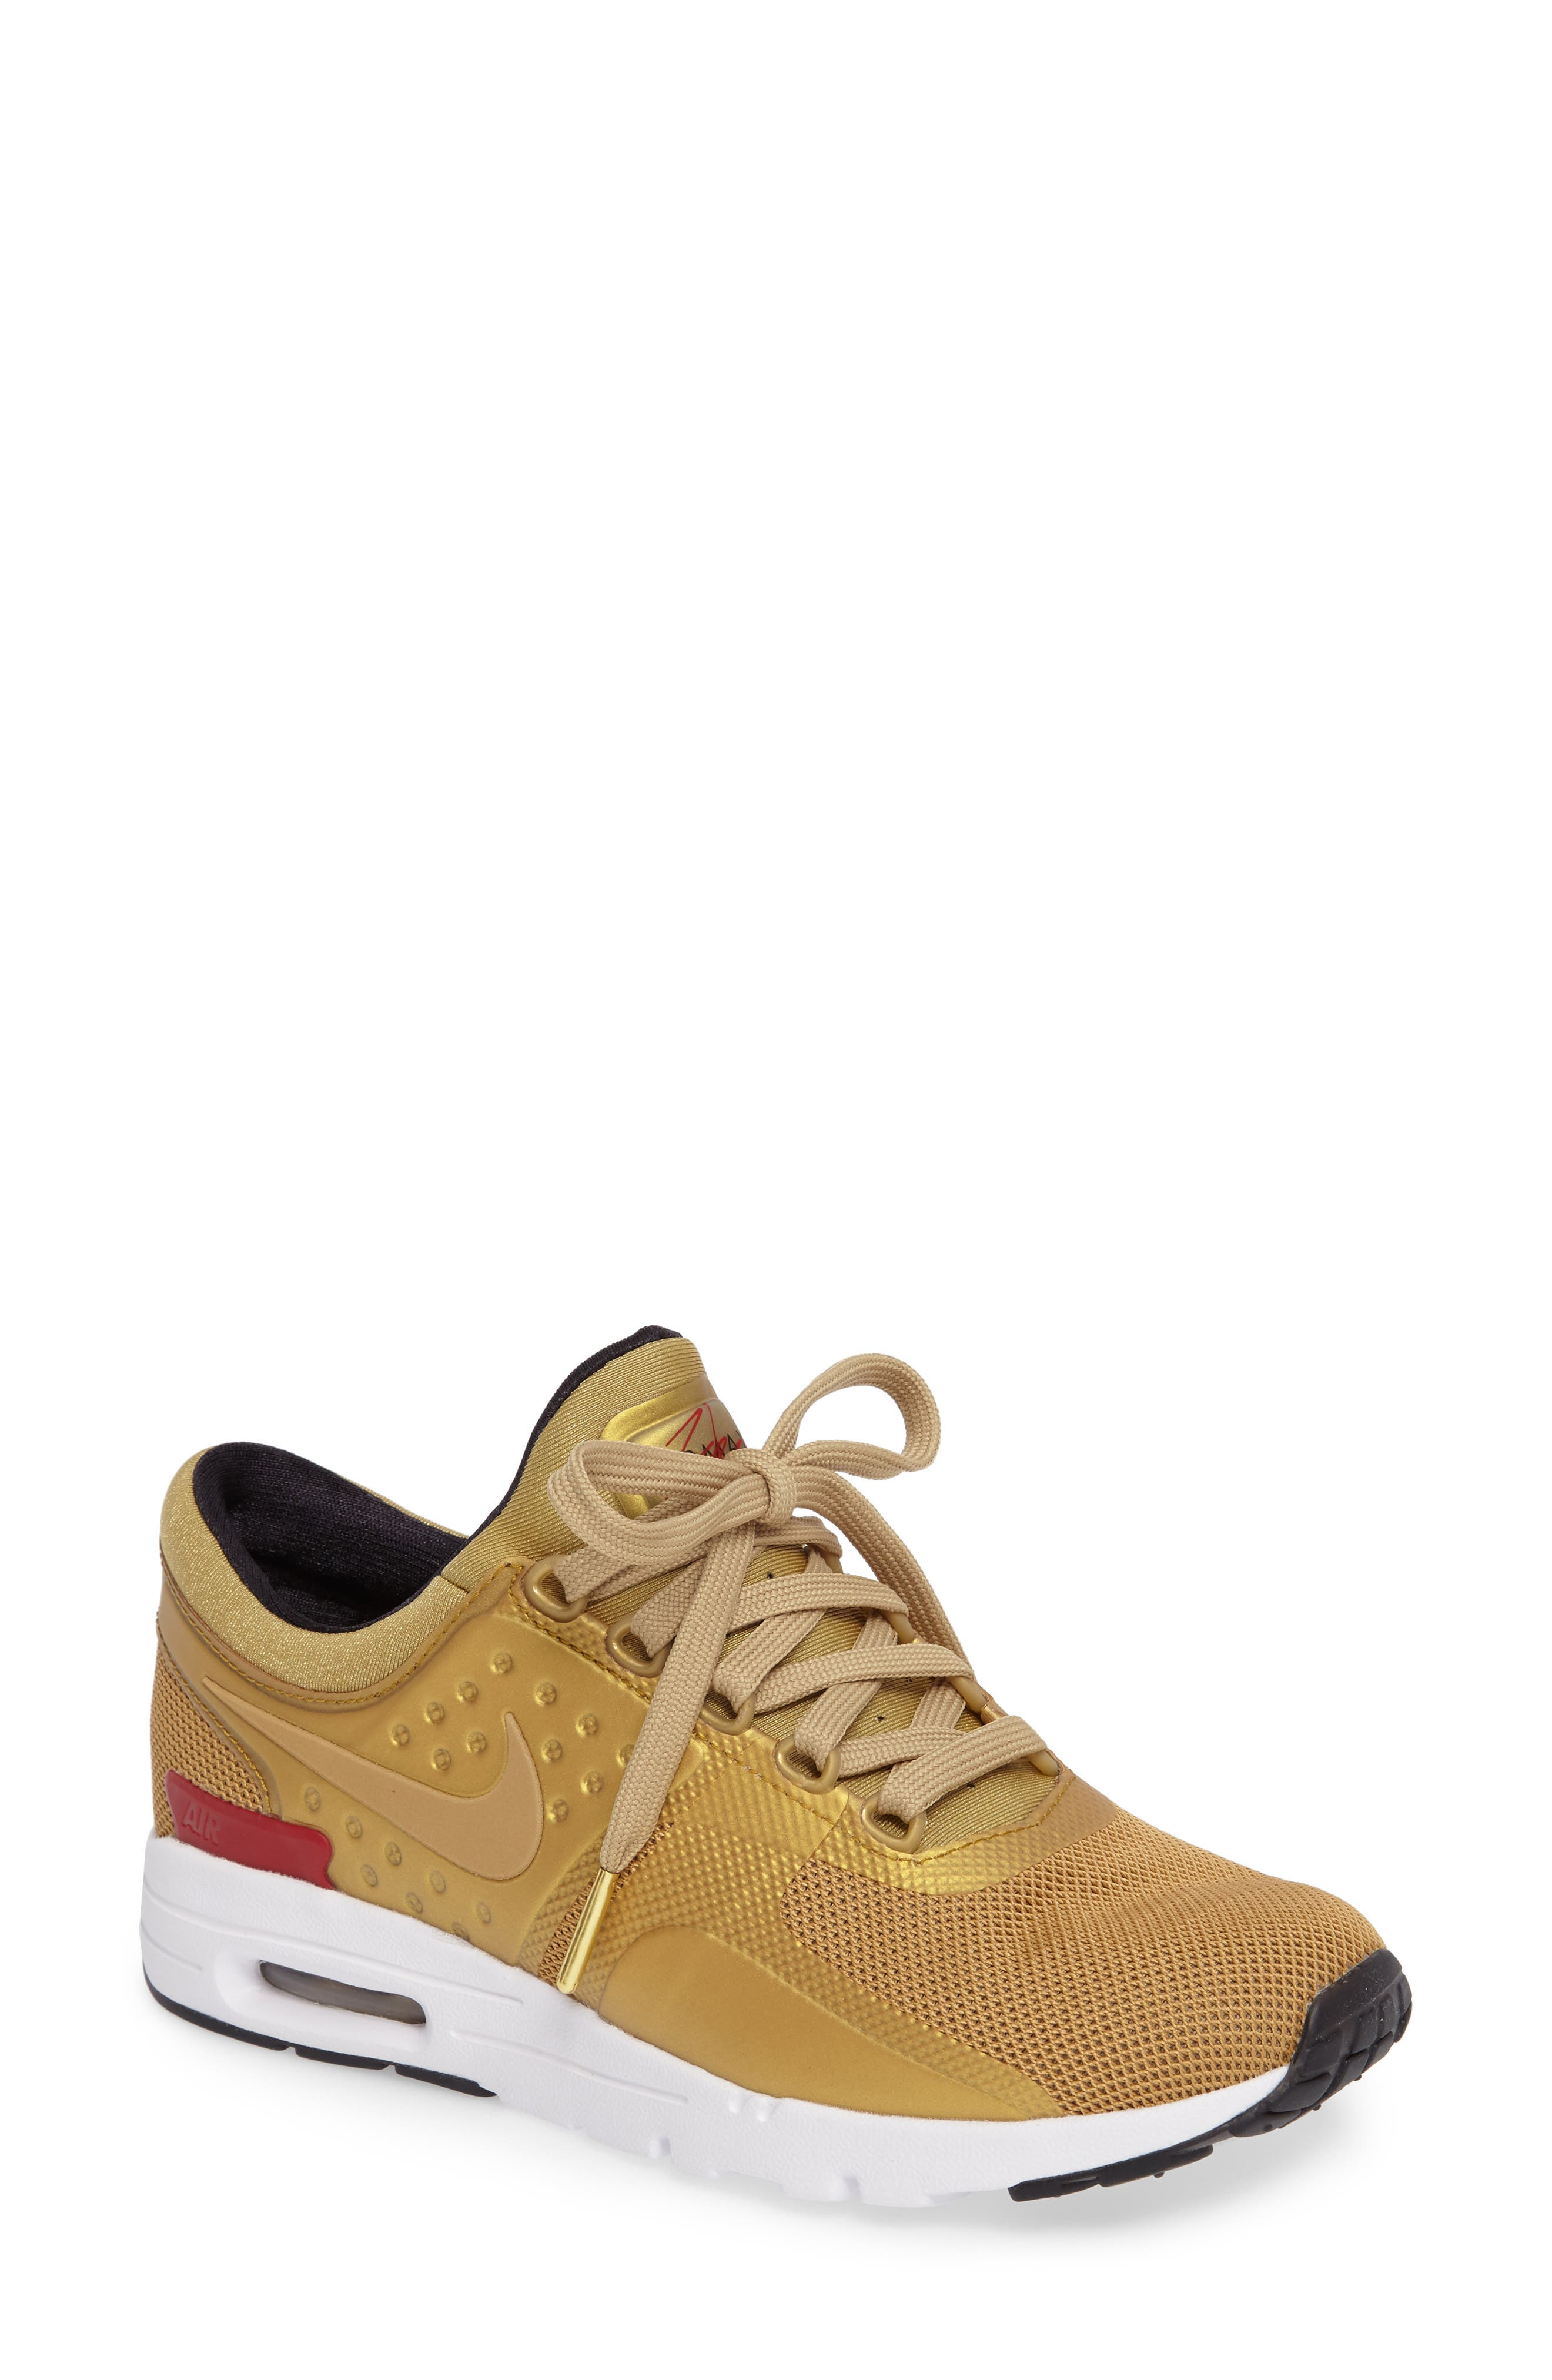 e68f709cdb ... coupon air max zero qs sneaker main color metallic gold abac7 1b347 ...